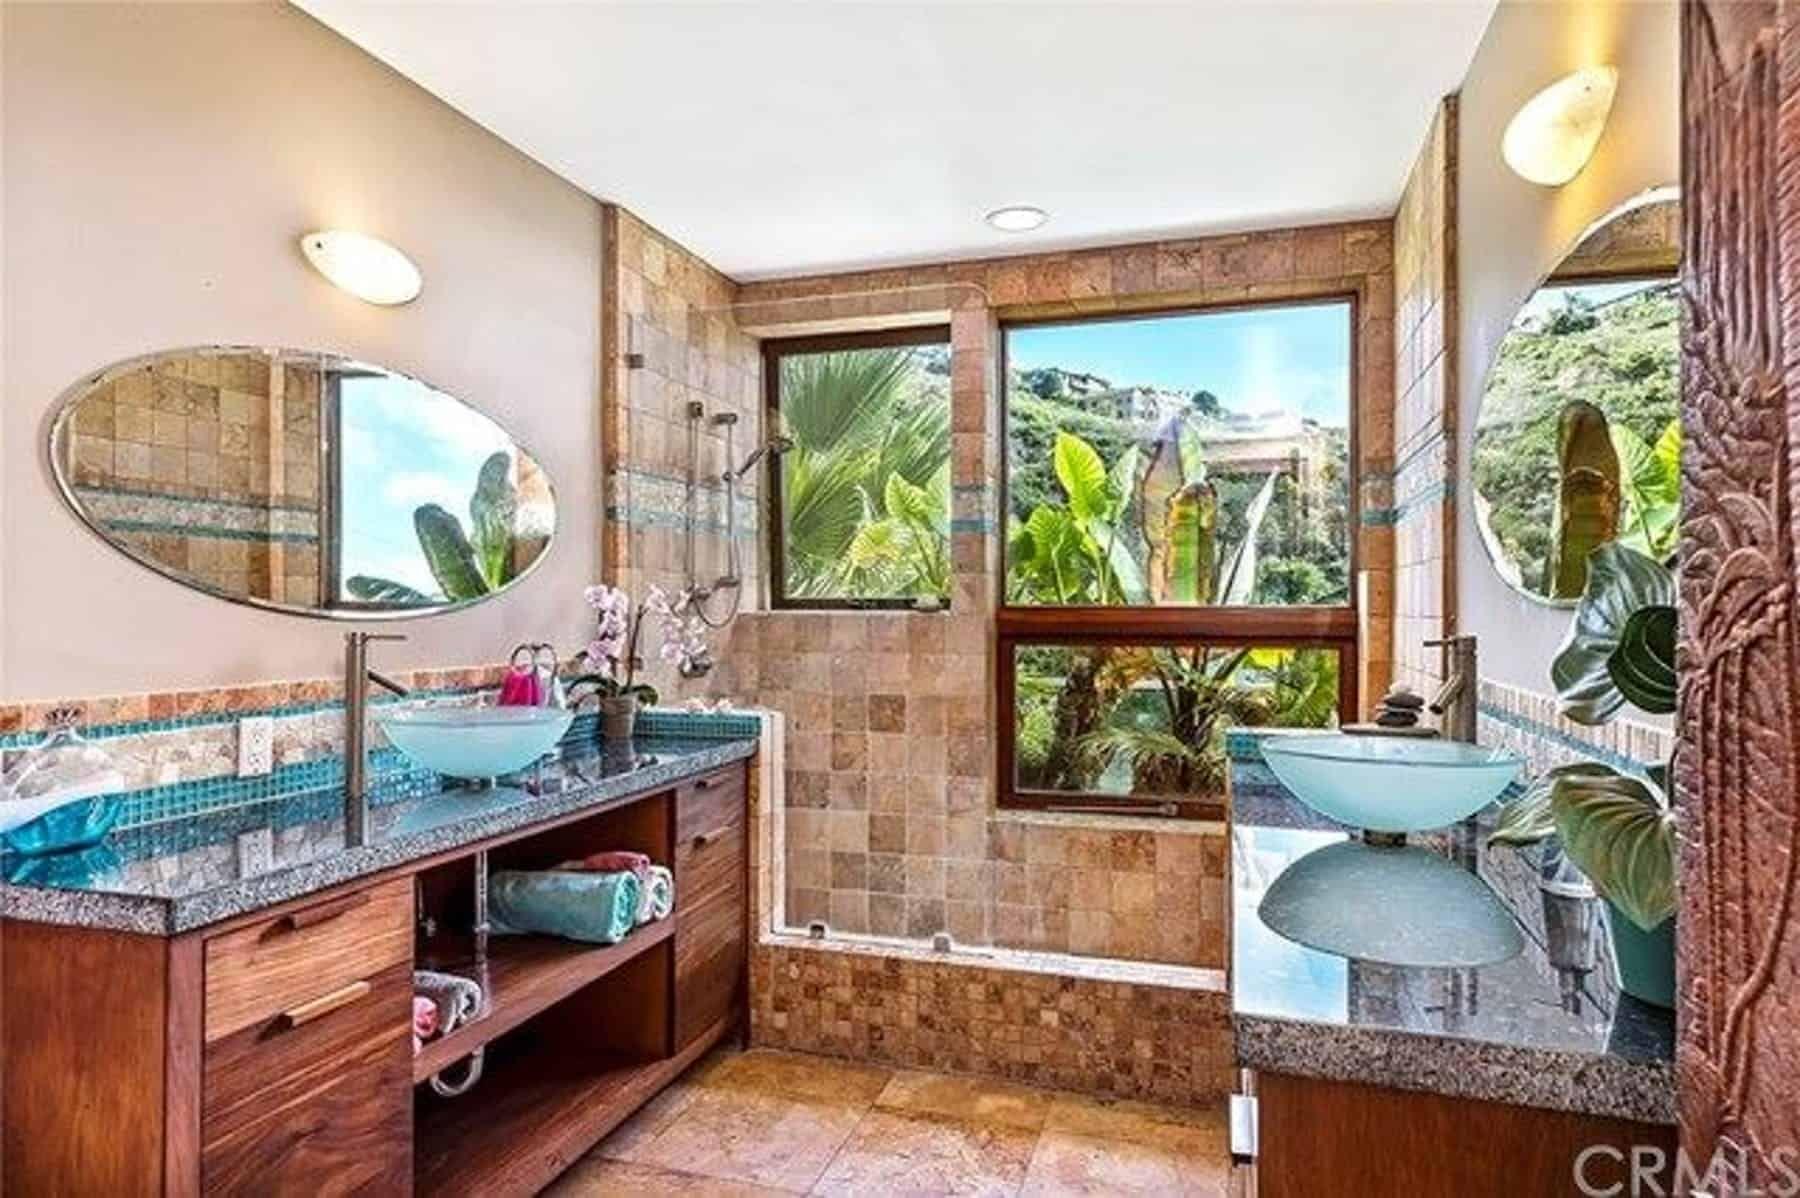 Photo of 45 Tropical-Style Master Bathroom Ideas (Photos)